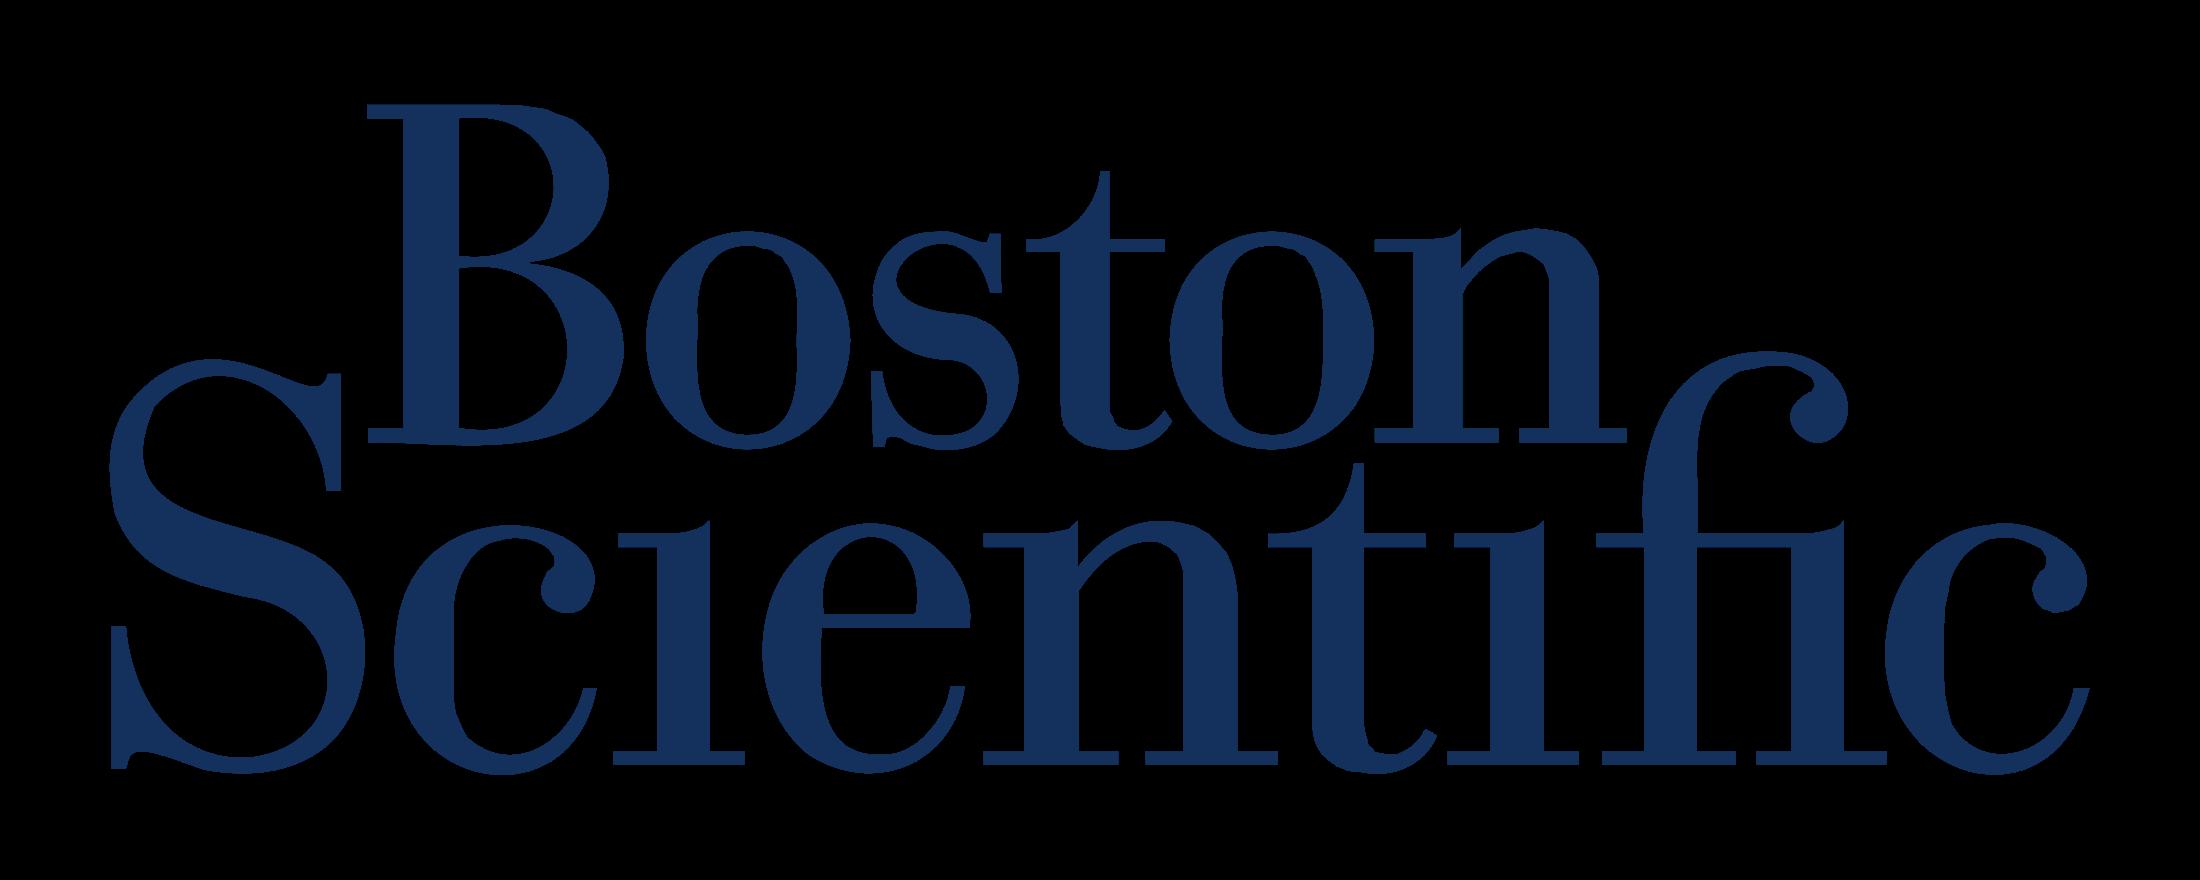 2000px-Boston_Scientific_Logo.png